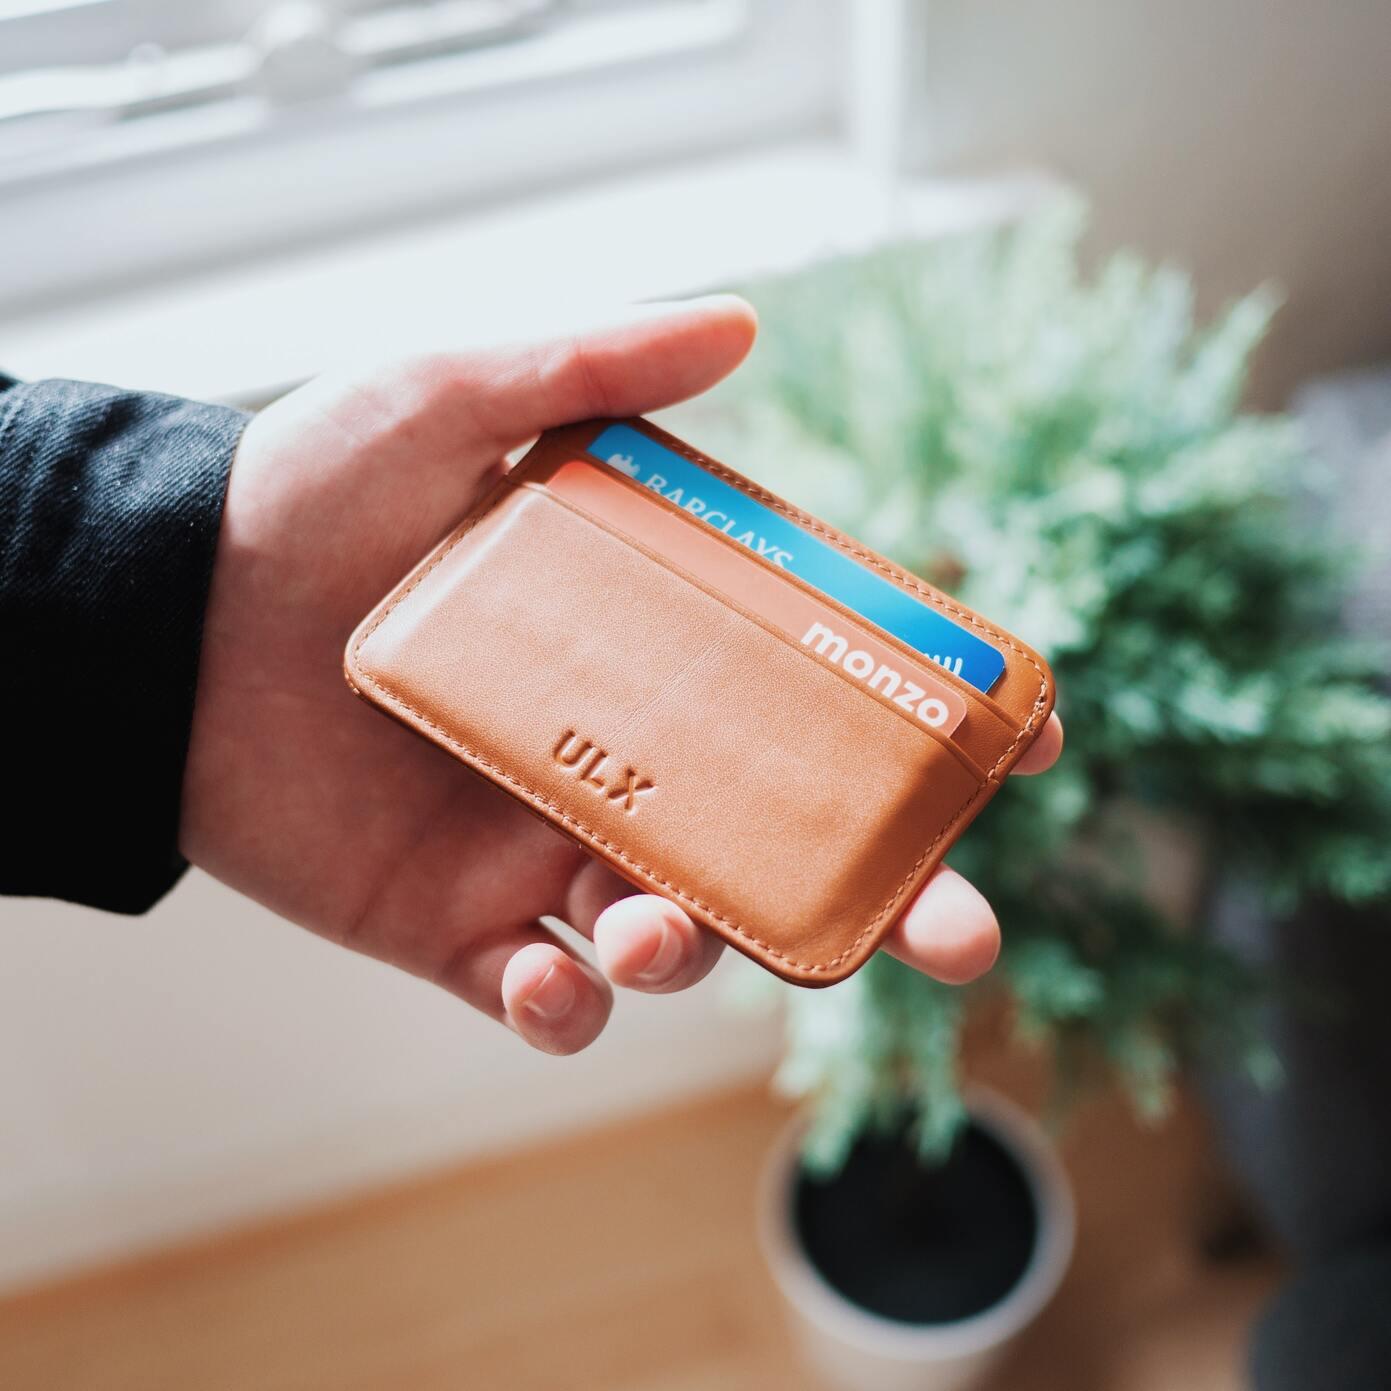 Minimalist Wallets for Men and Women